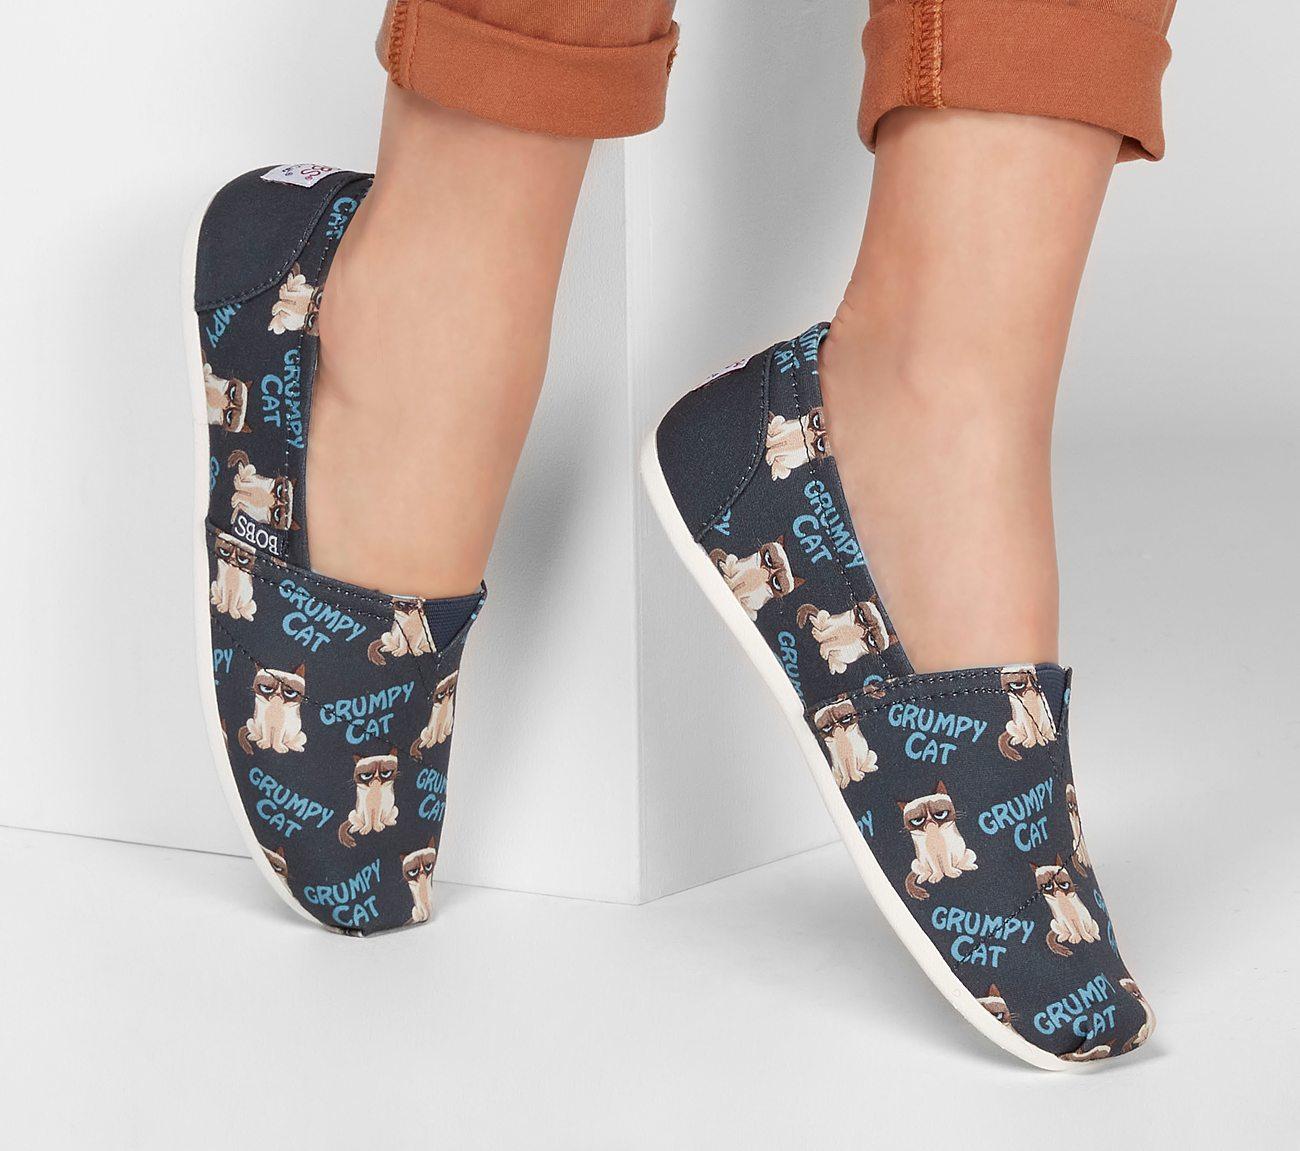 Buy SKECHERS BOBS Plush - Crabby Kitty